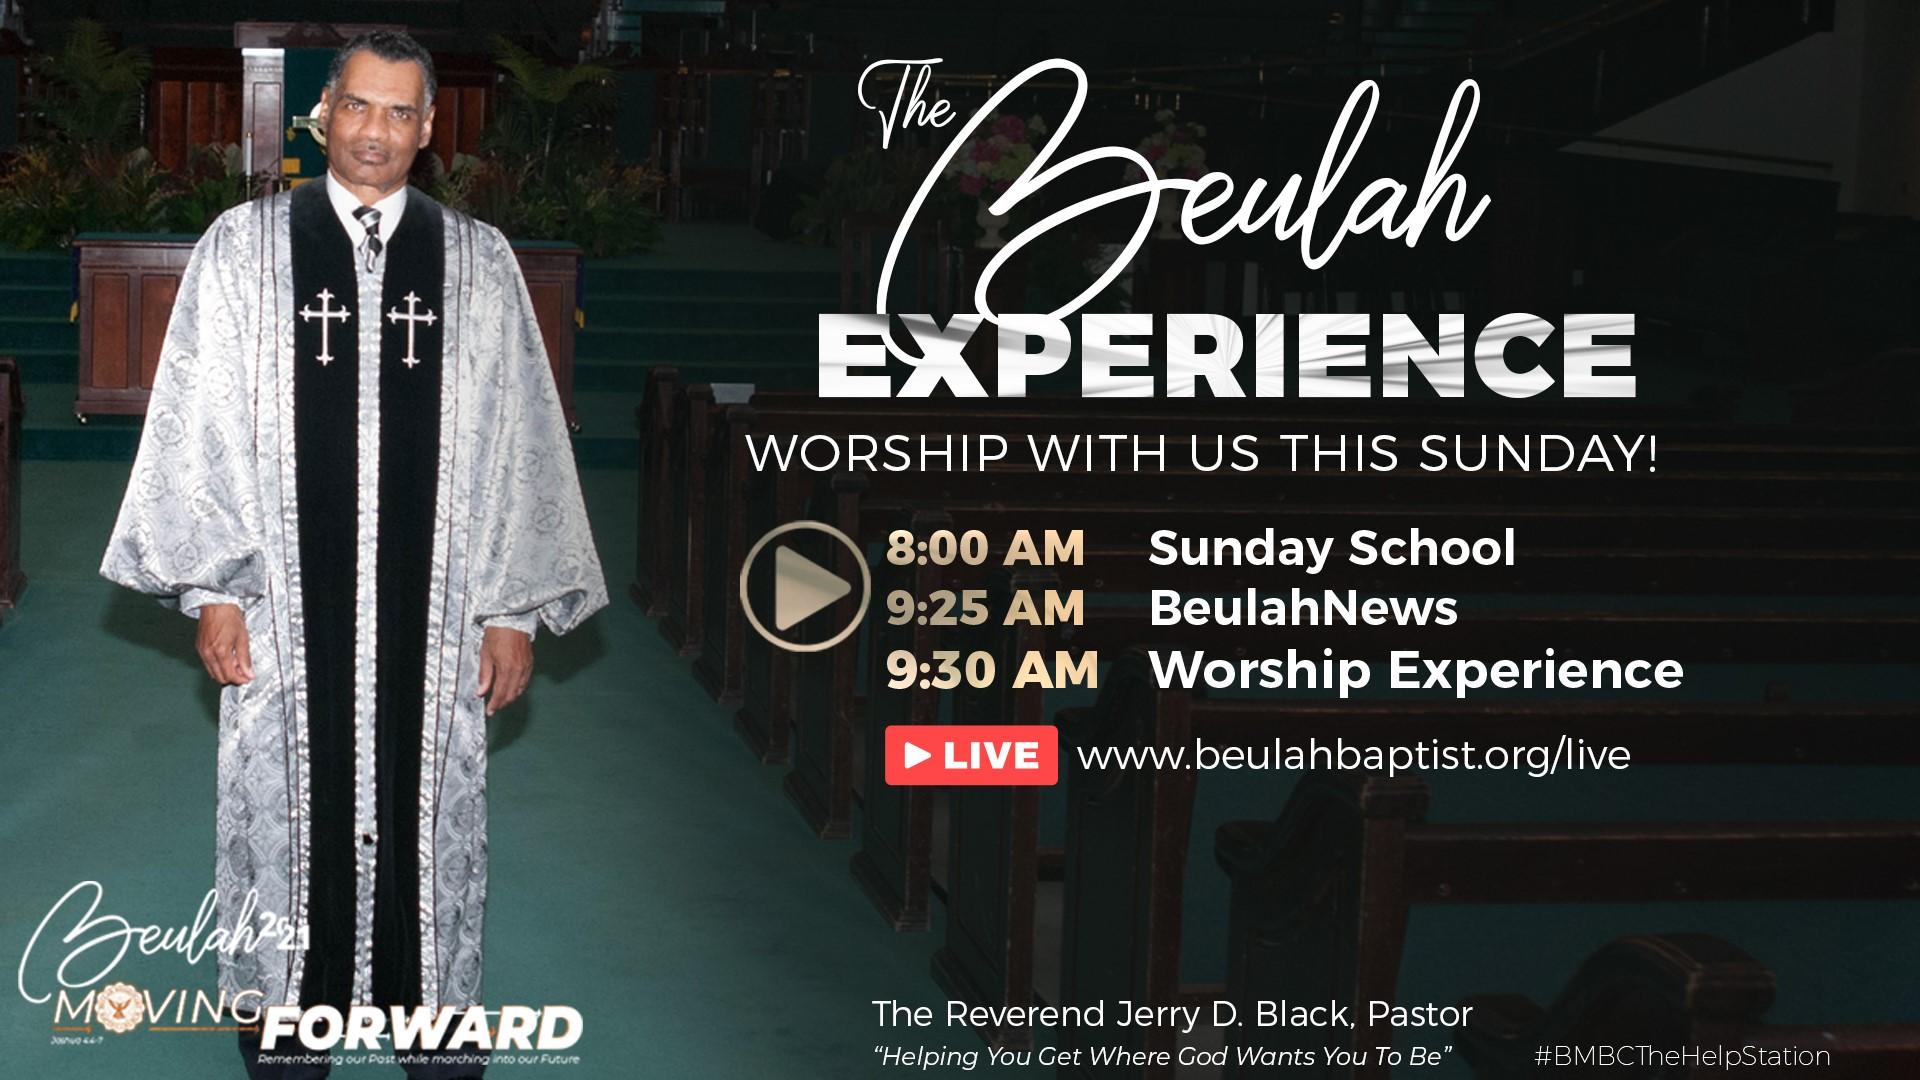 Beulah Missionary Baptist Church, Decatur, GA.  on 01-Aug-21-13:23:11